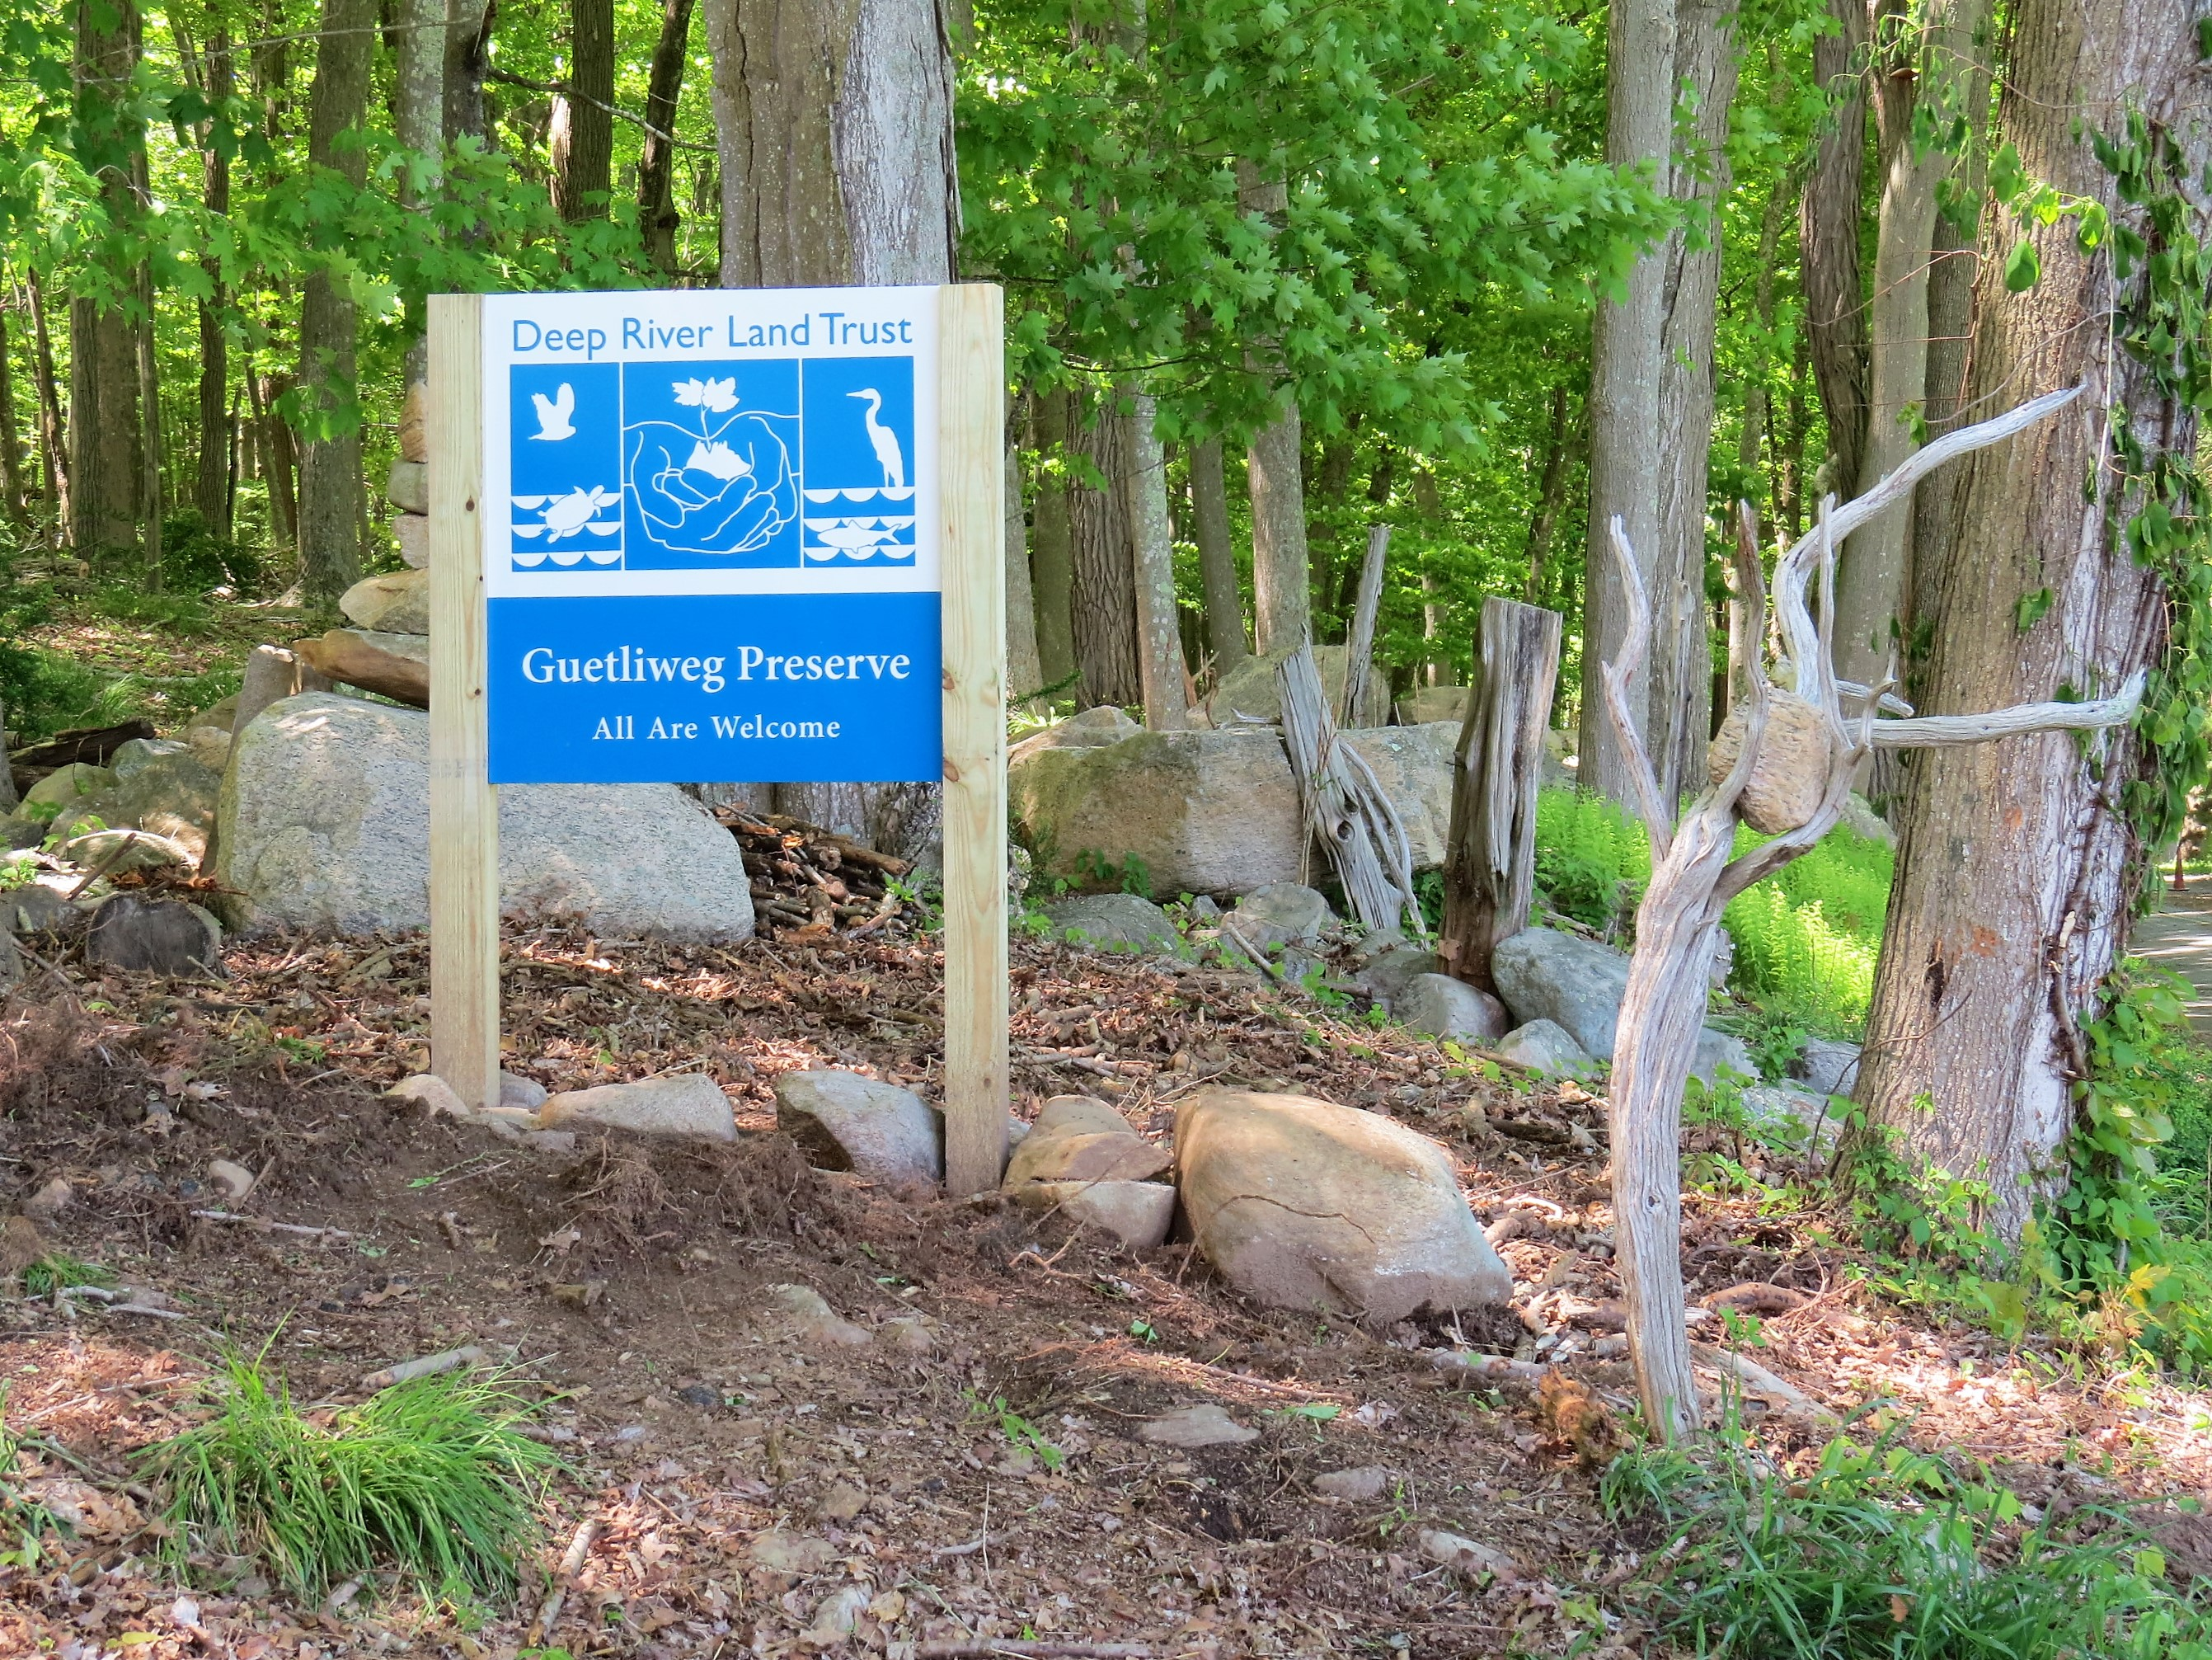 Guetliweg Preserve signage